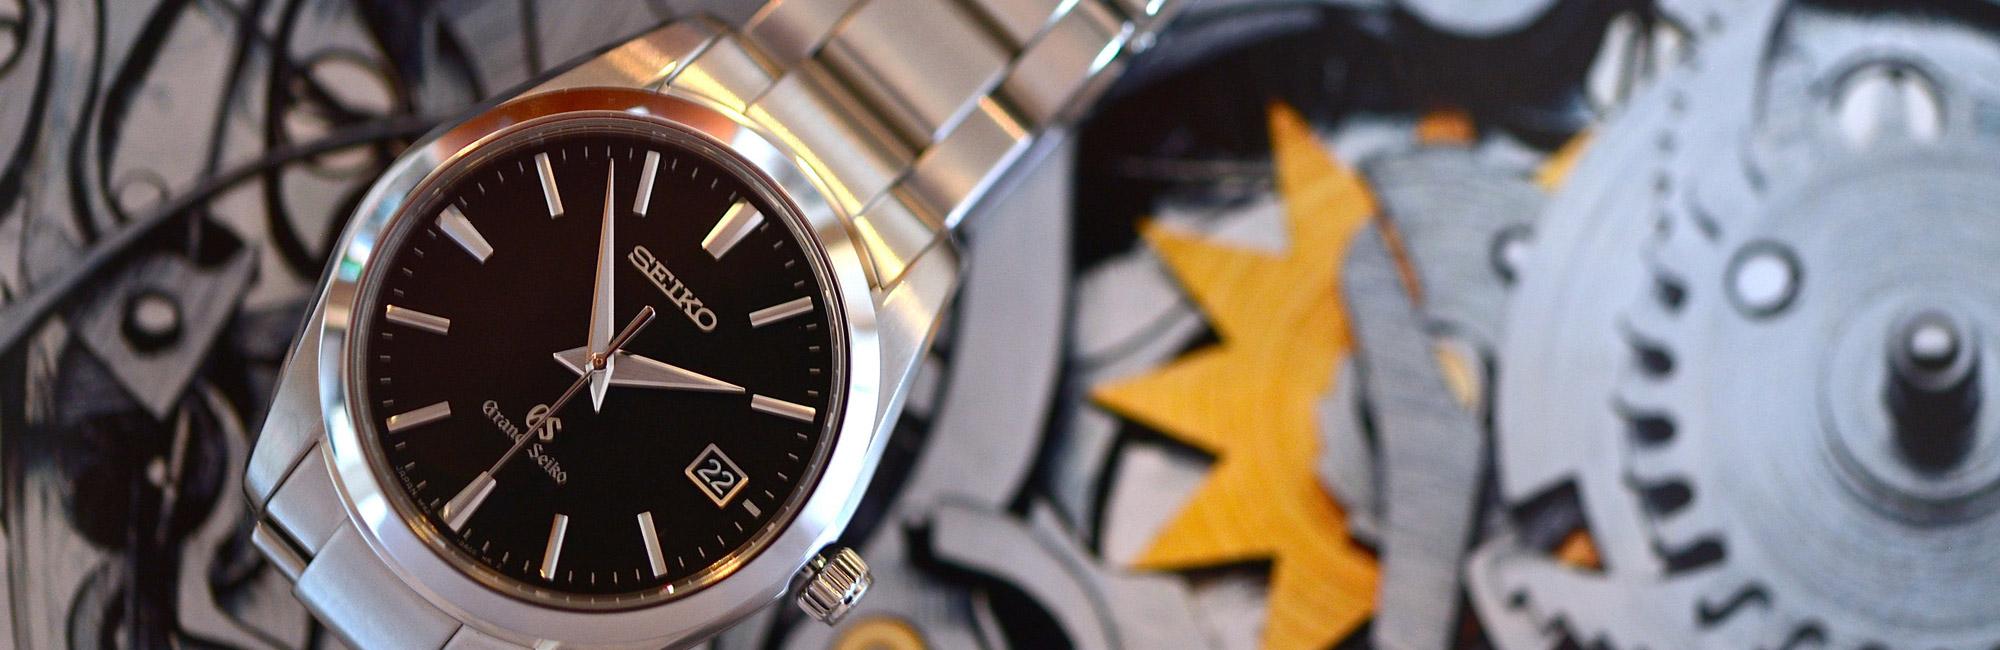 1-orologi-seiko-cauzzi-solferino-mantova